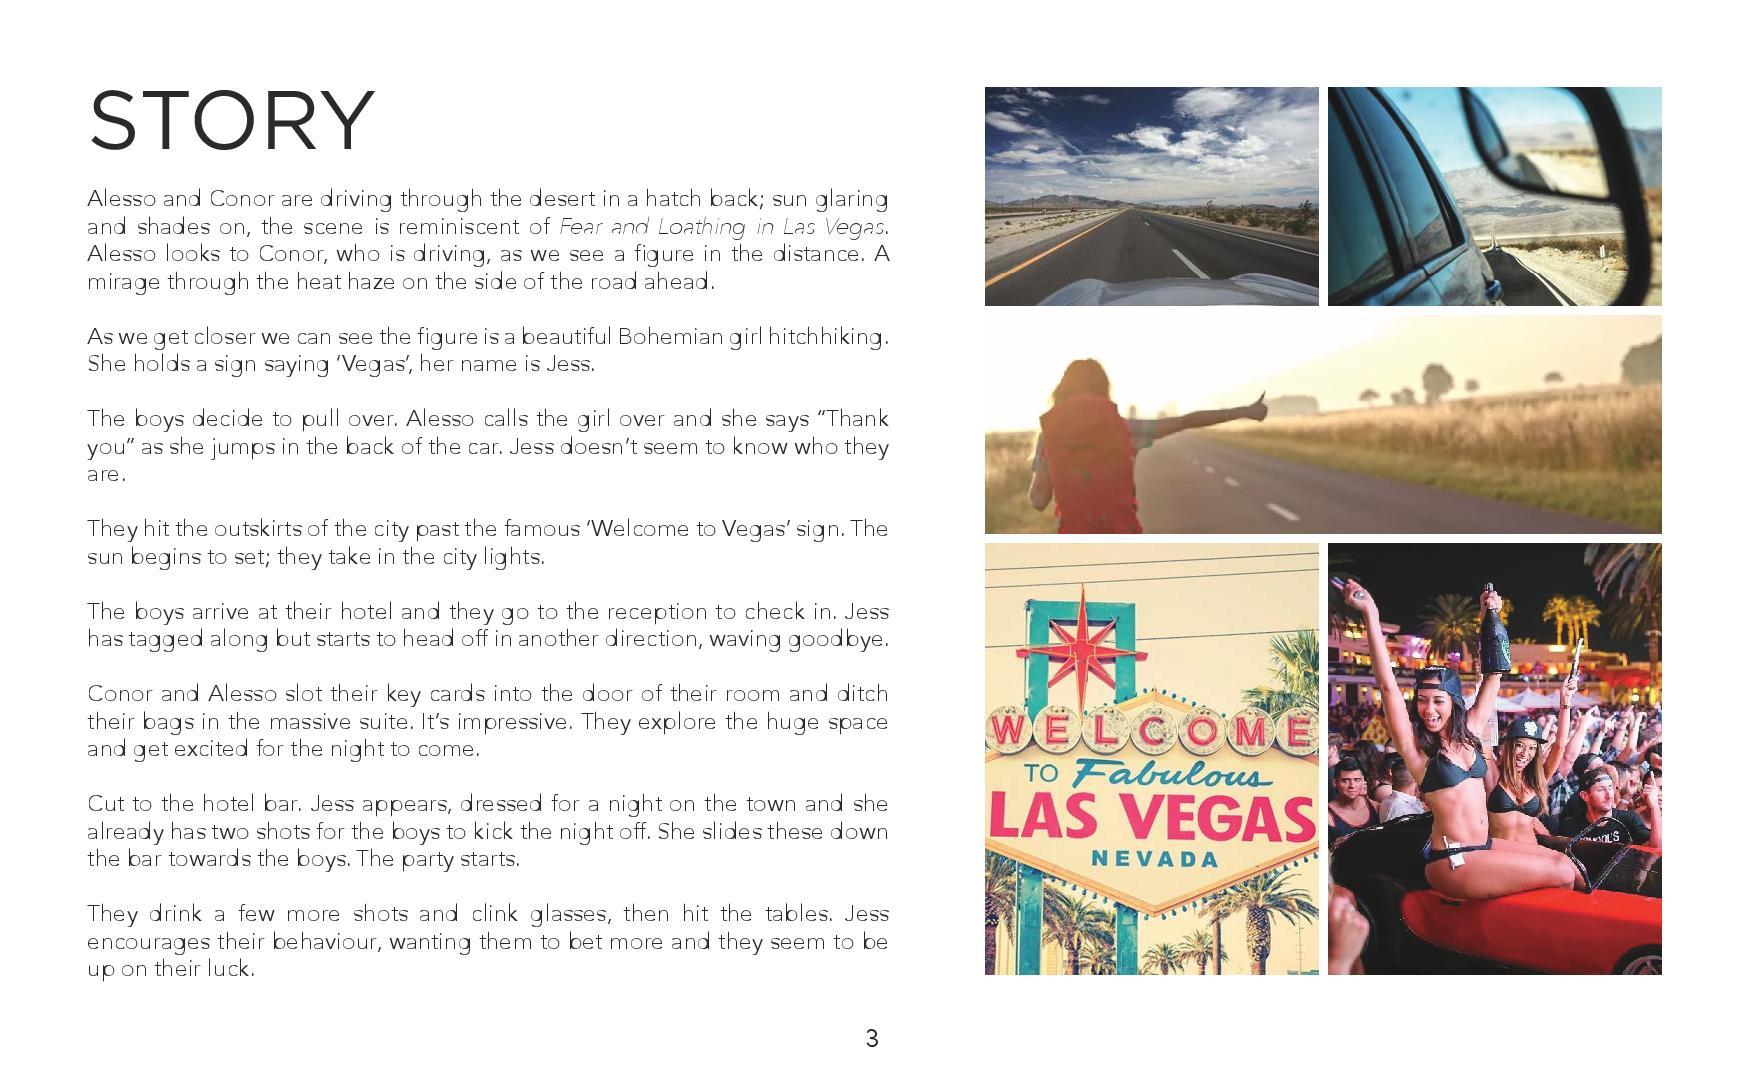 CRAZY-page-003.jpg